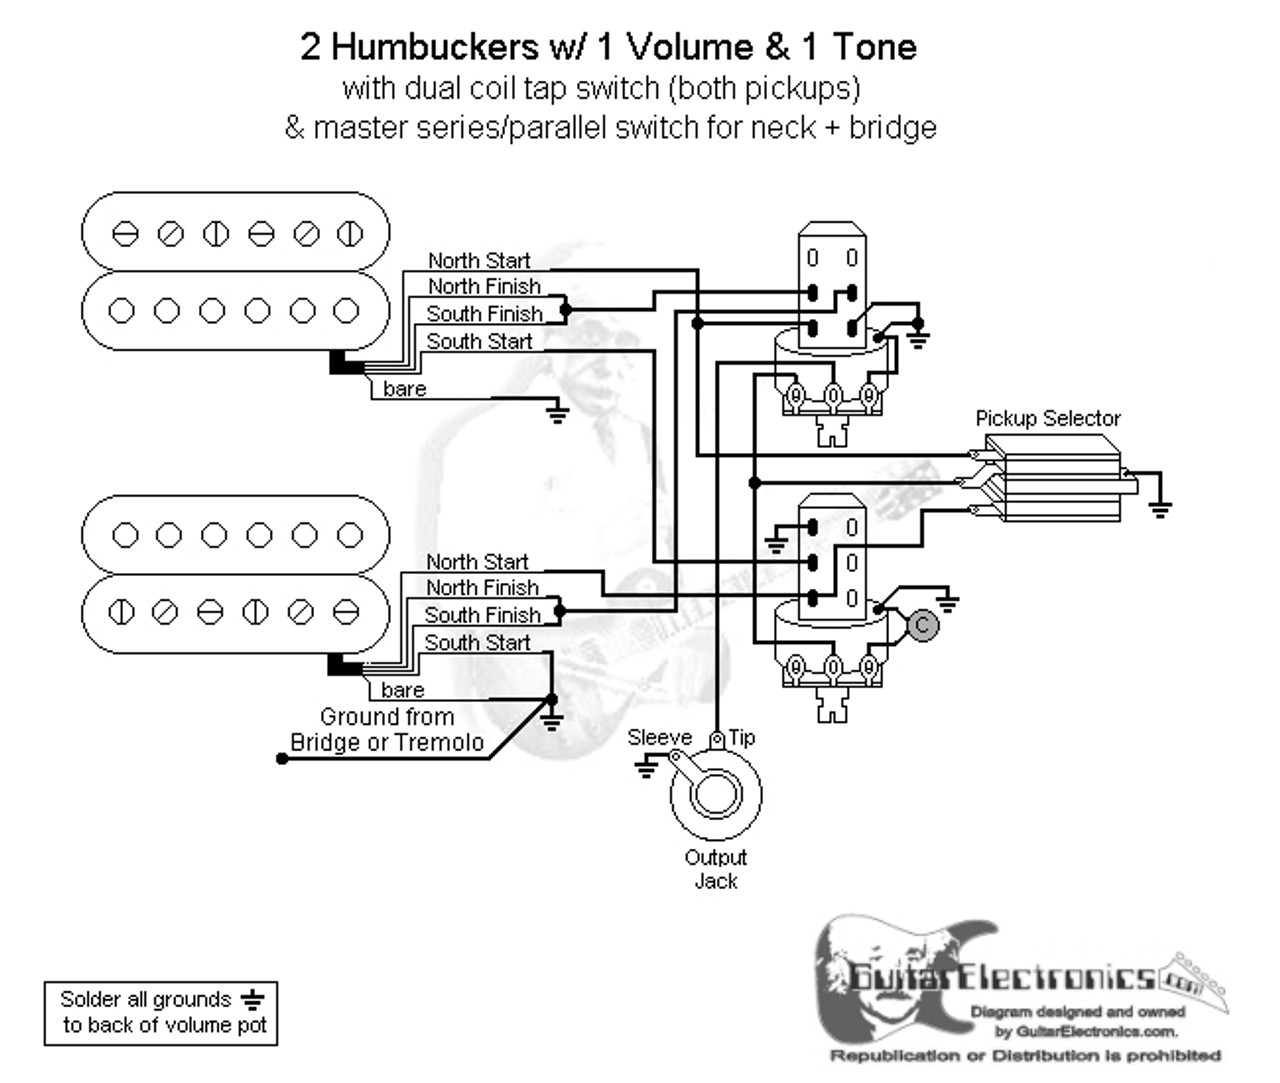 2 hbs 3 way toggle 1 vol 1 tone coil tap series parallel 2 humbucker 1 vol 1 wiring diagrams [ 1280 x 1083 Pixel ]